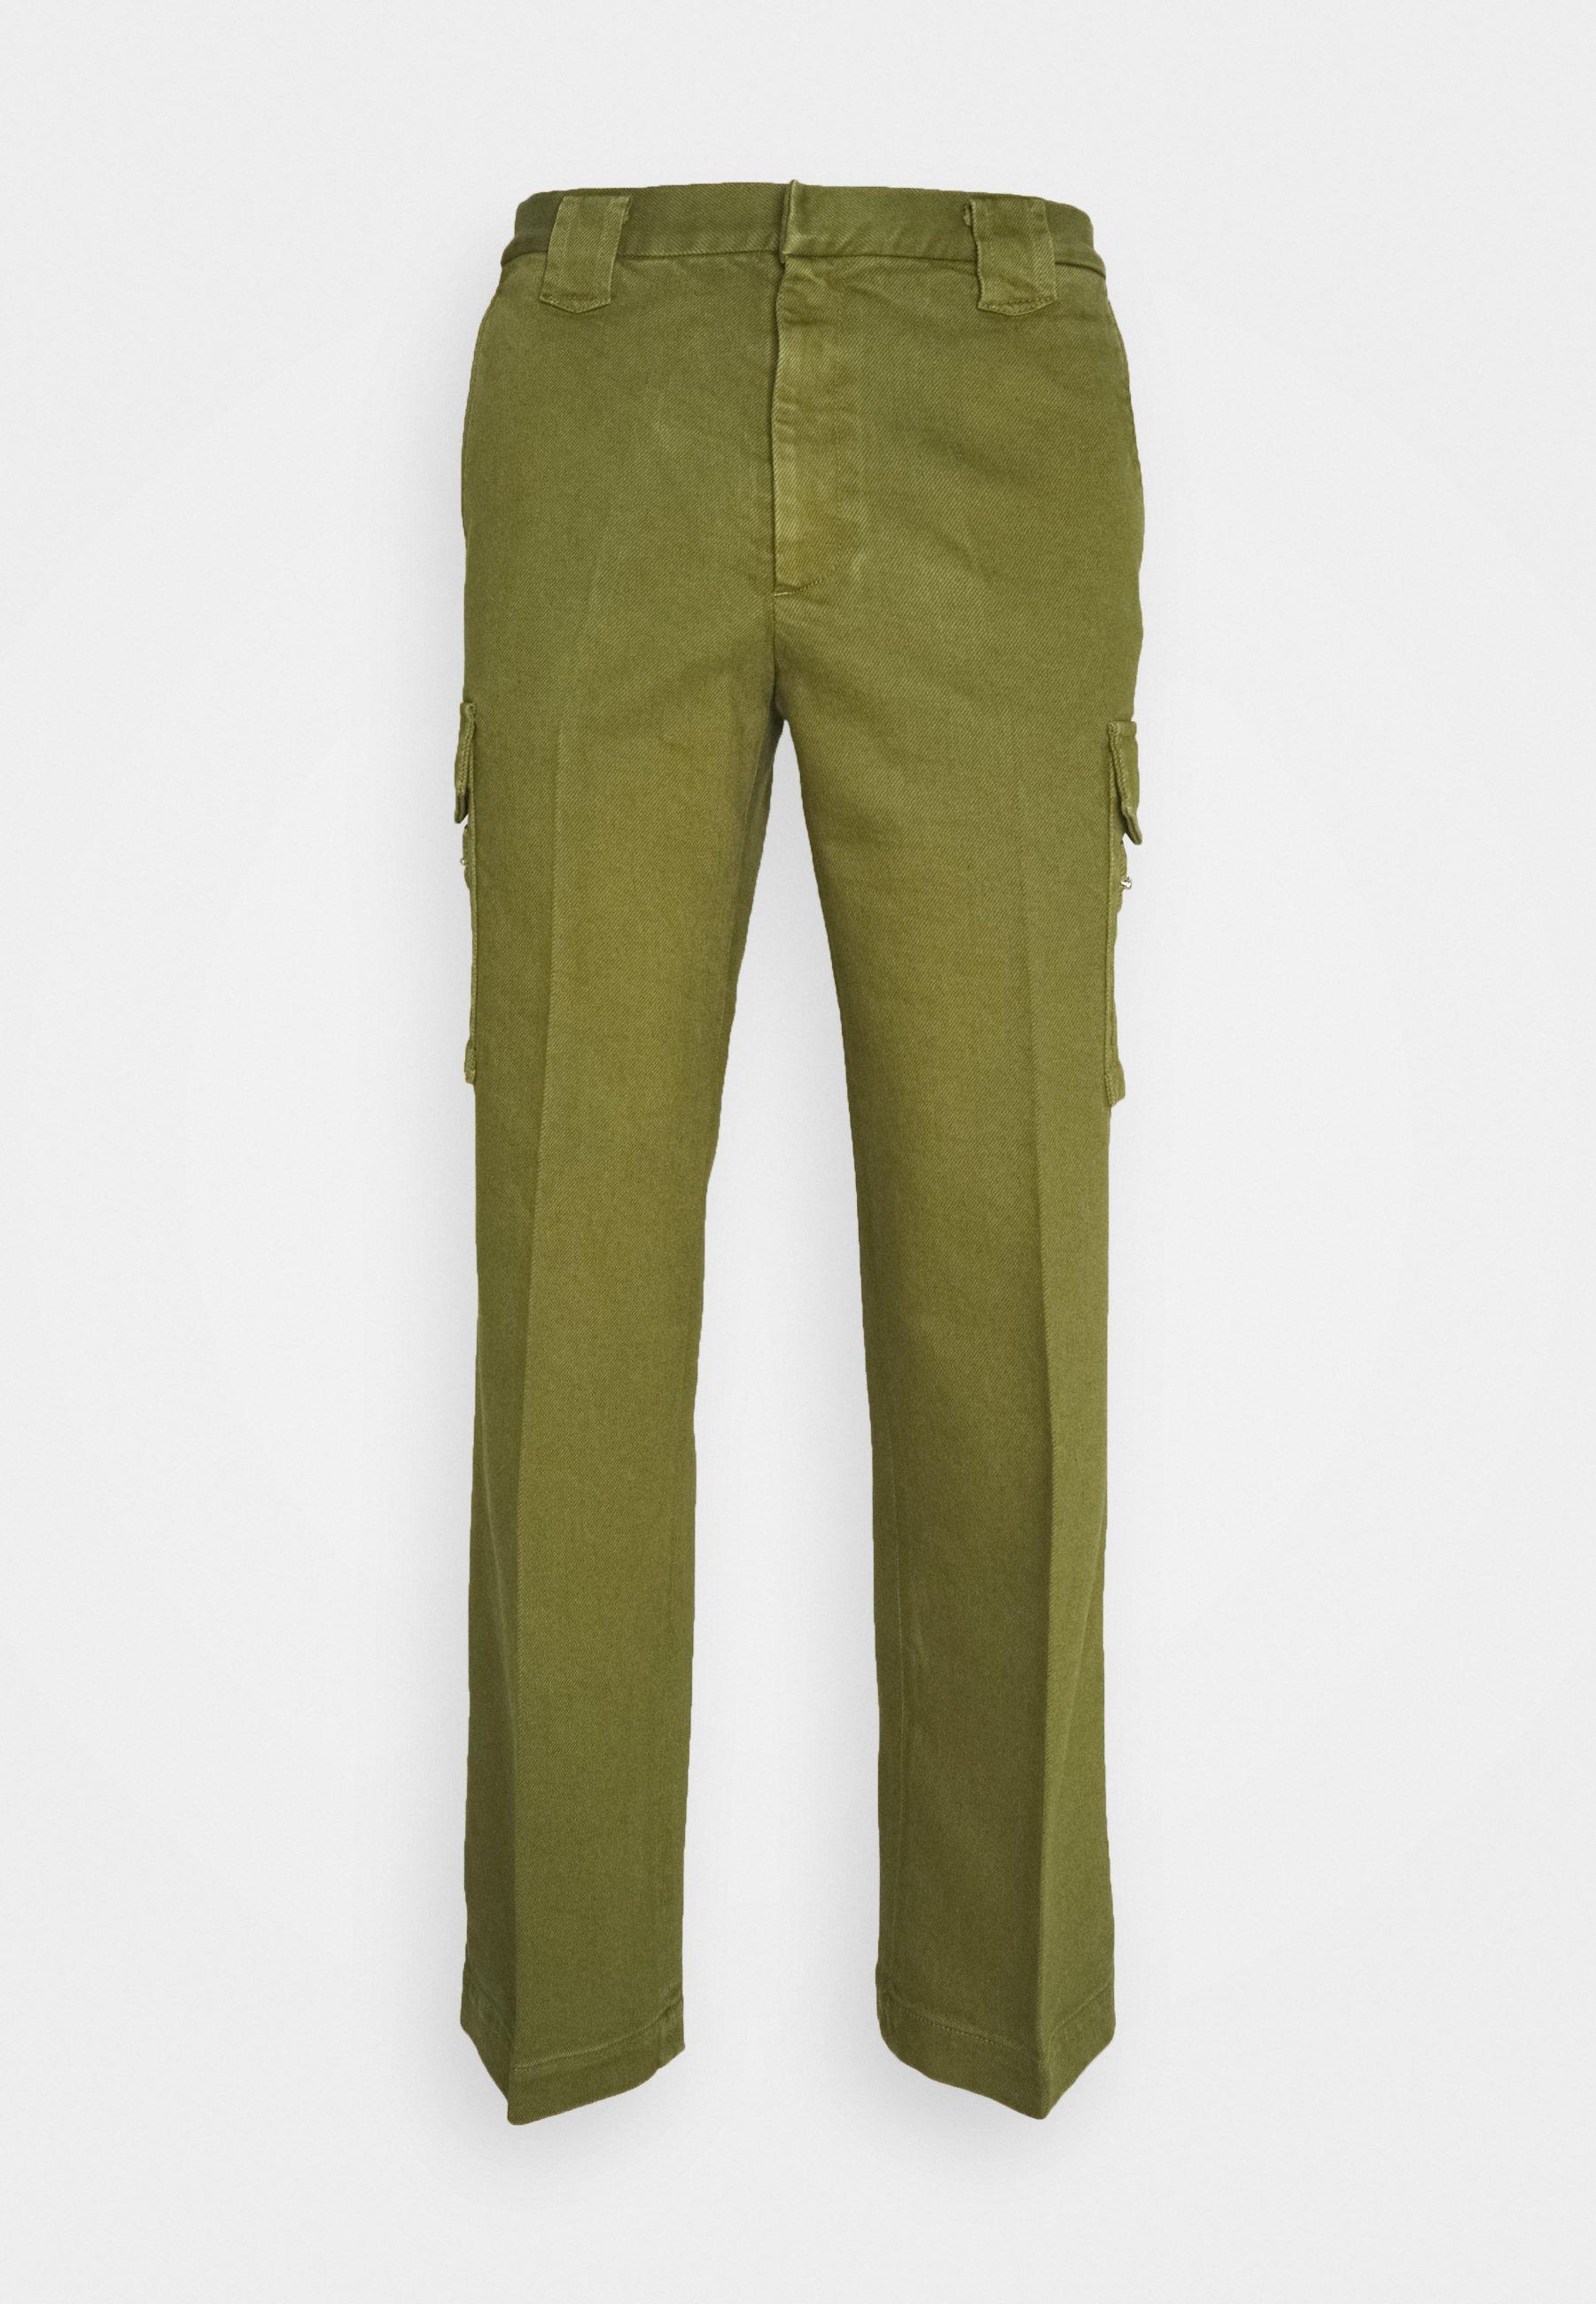 Homme JACKSON PANTS - Pantalon cargo